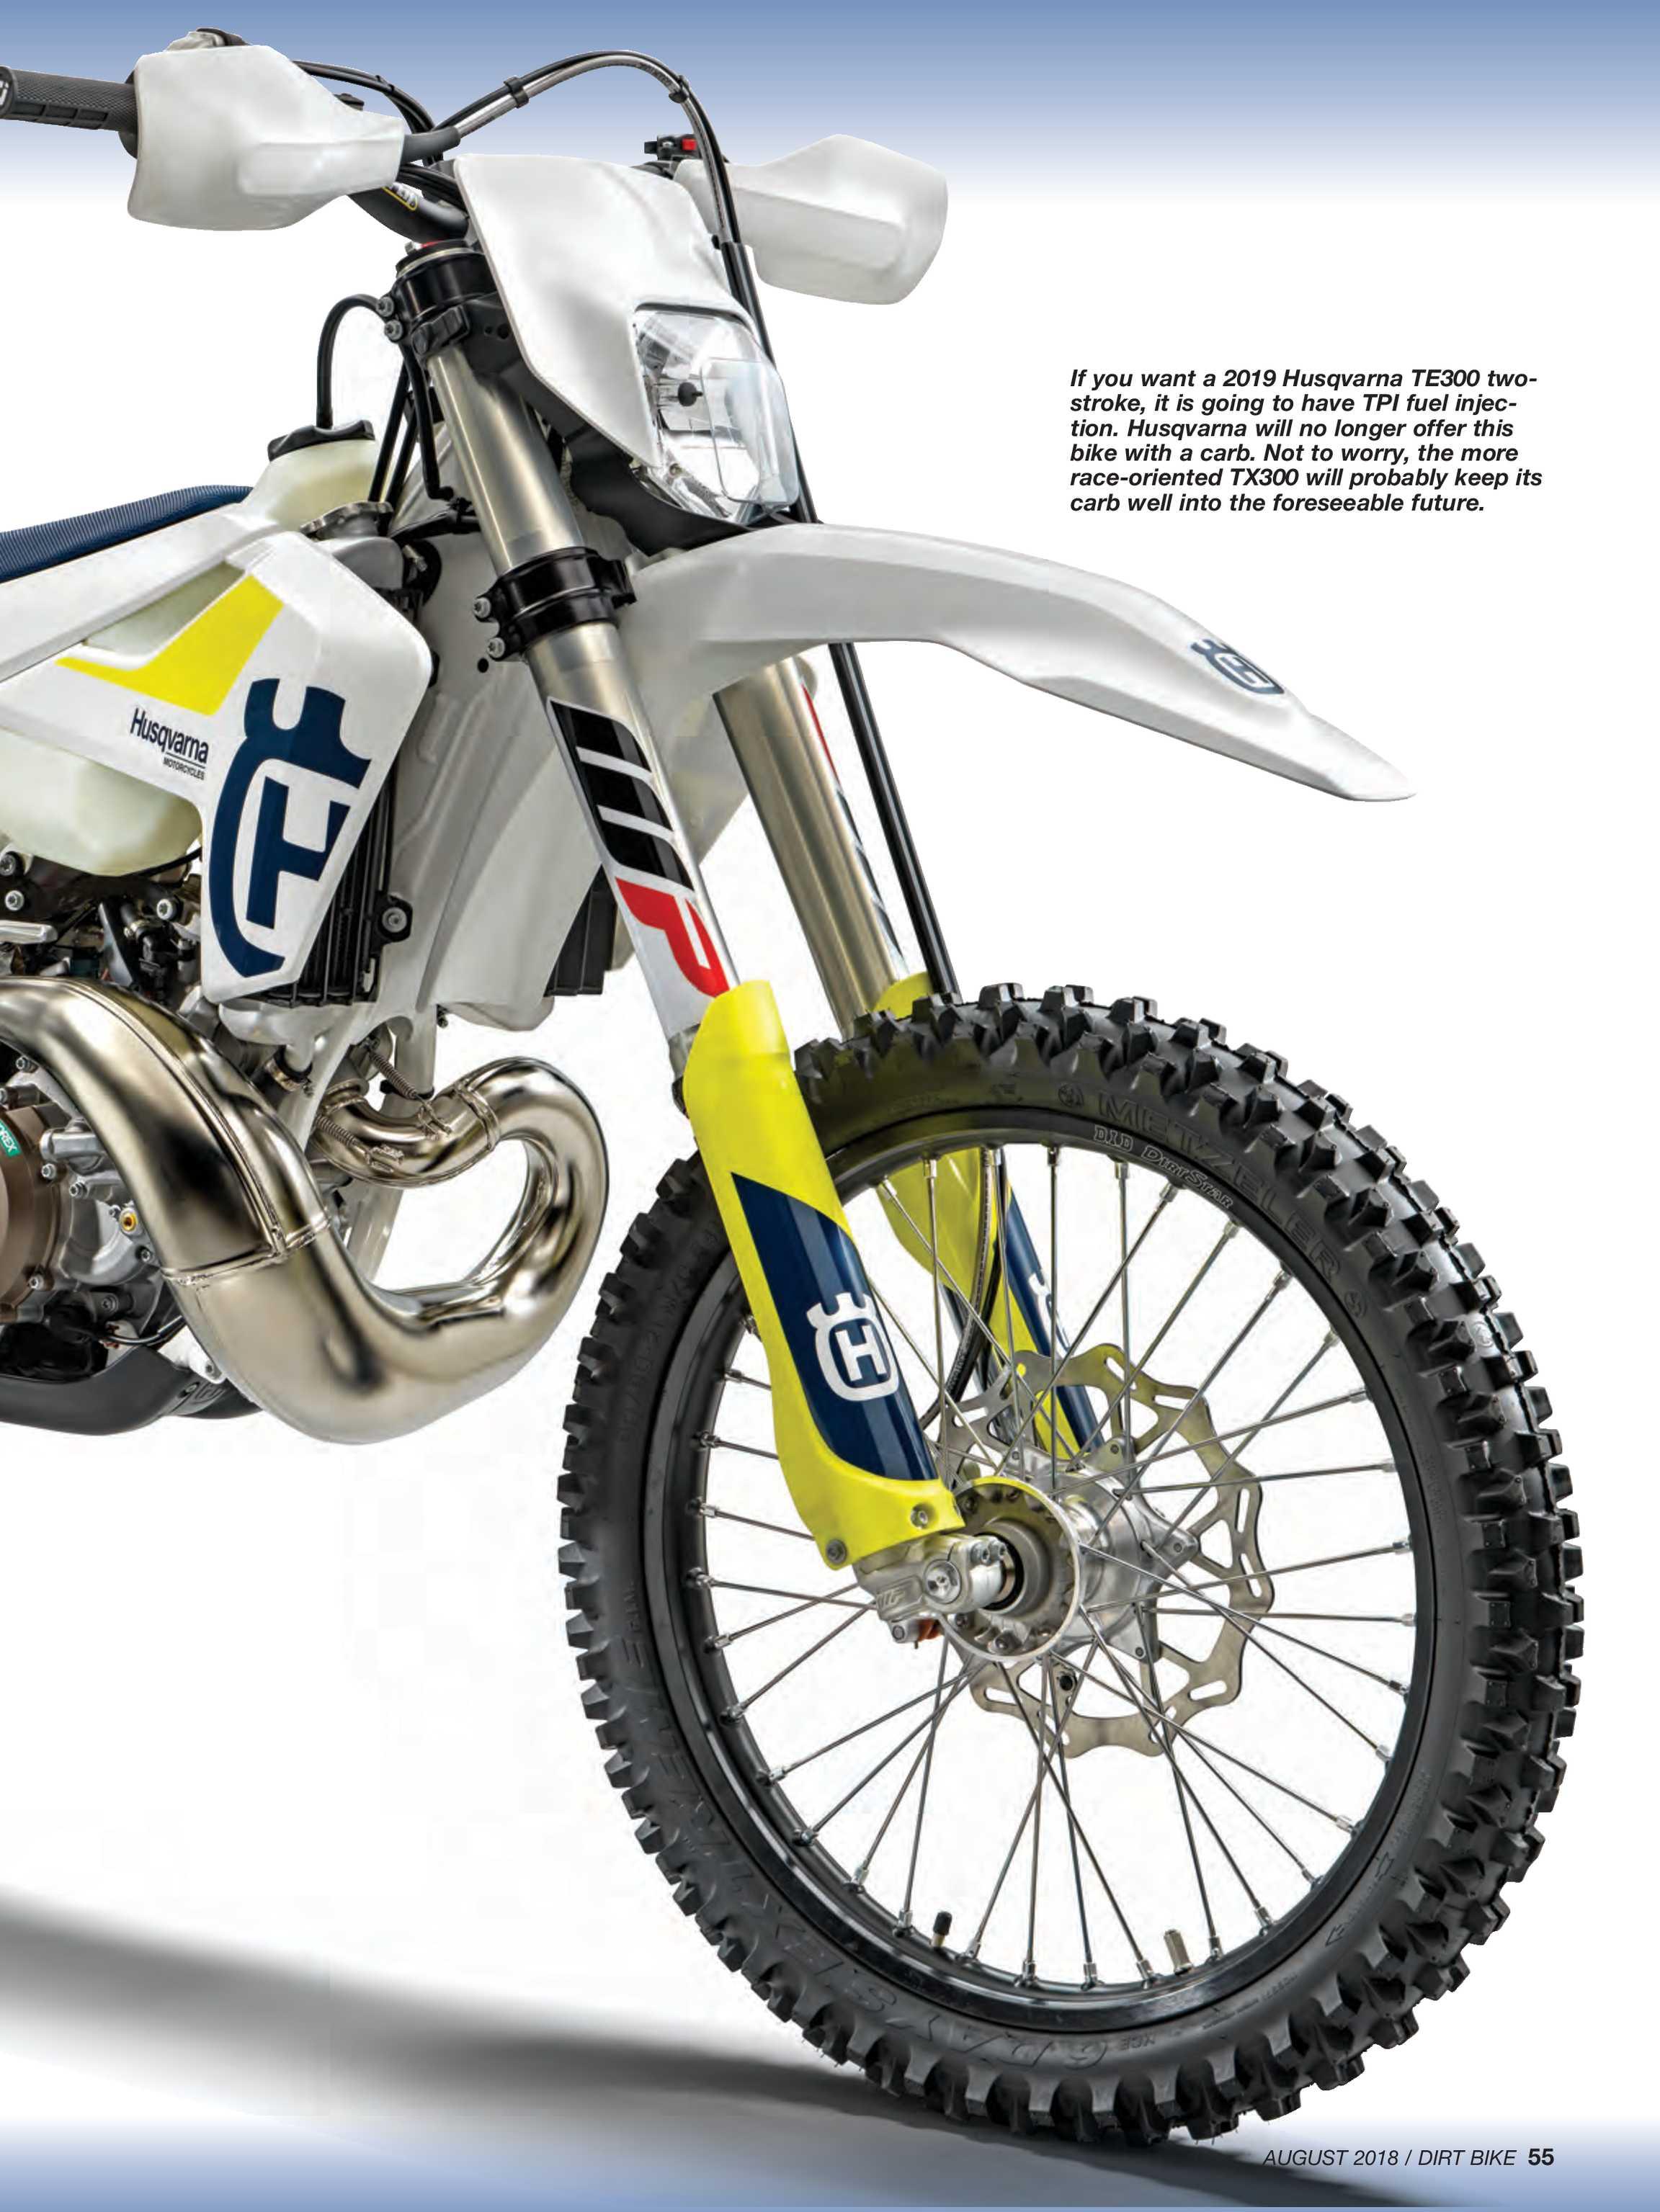 Dirt Bike Magazine - August 2018 - page 54